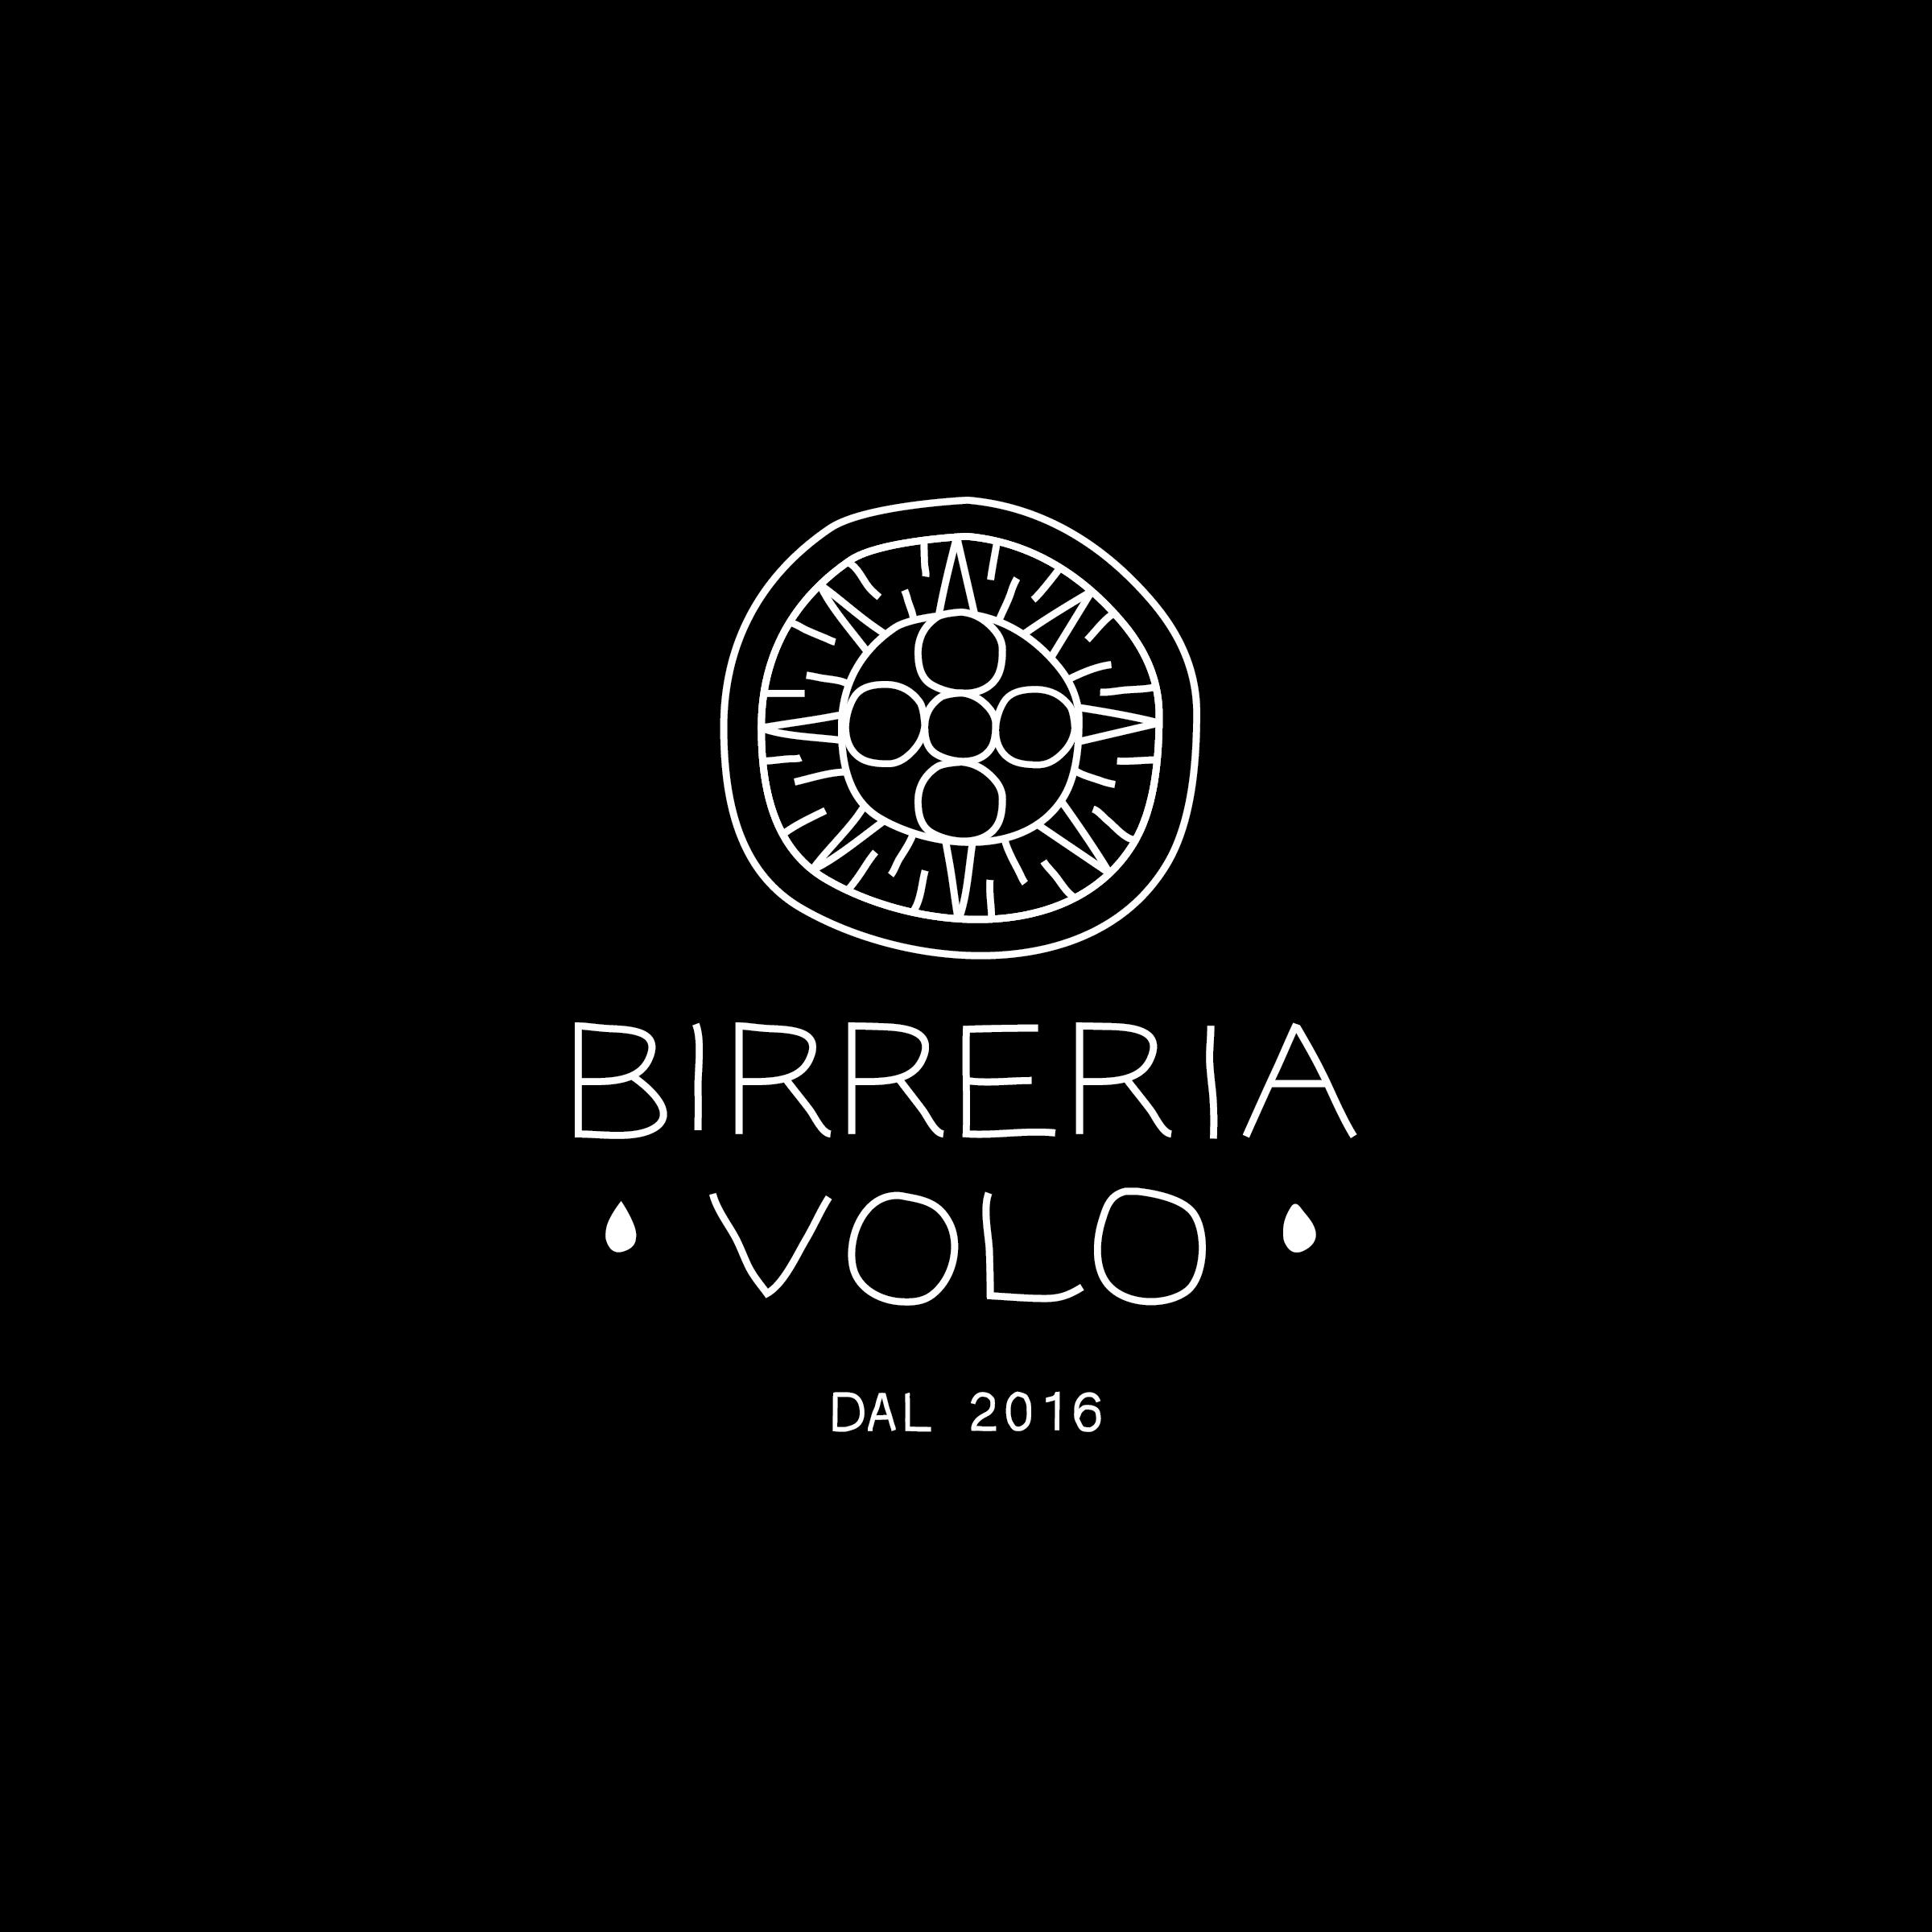 BIRRERIA_VOLO_FINAL_ASSETSai-04.jpg